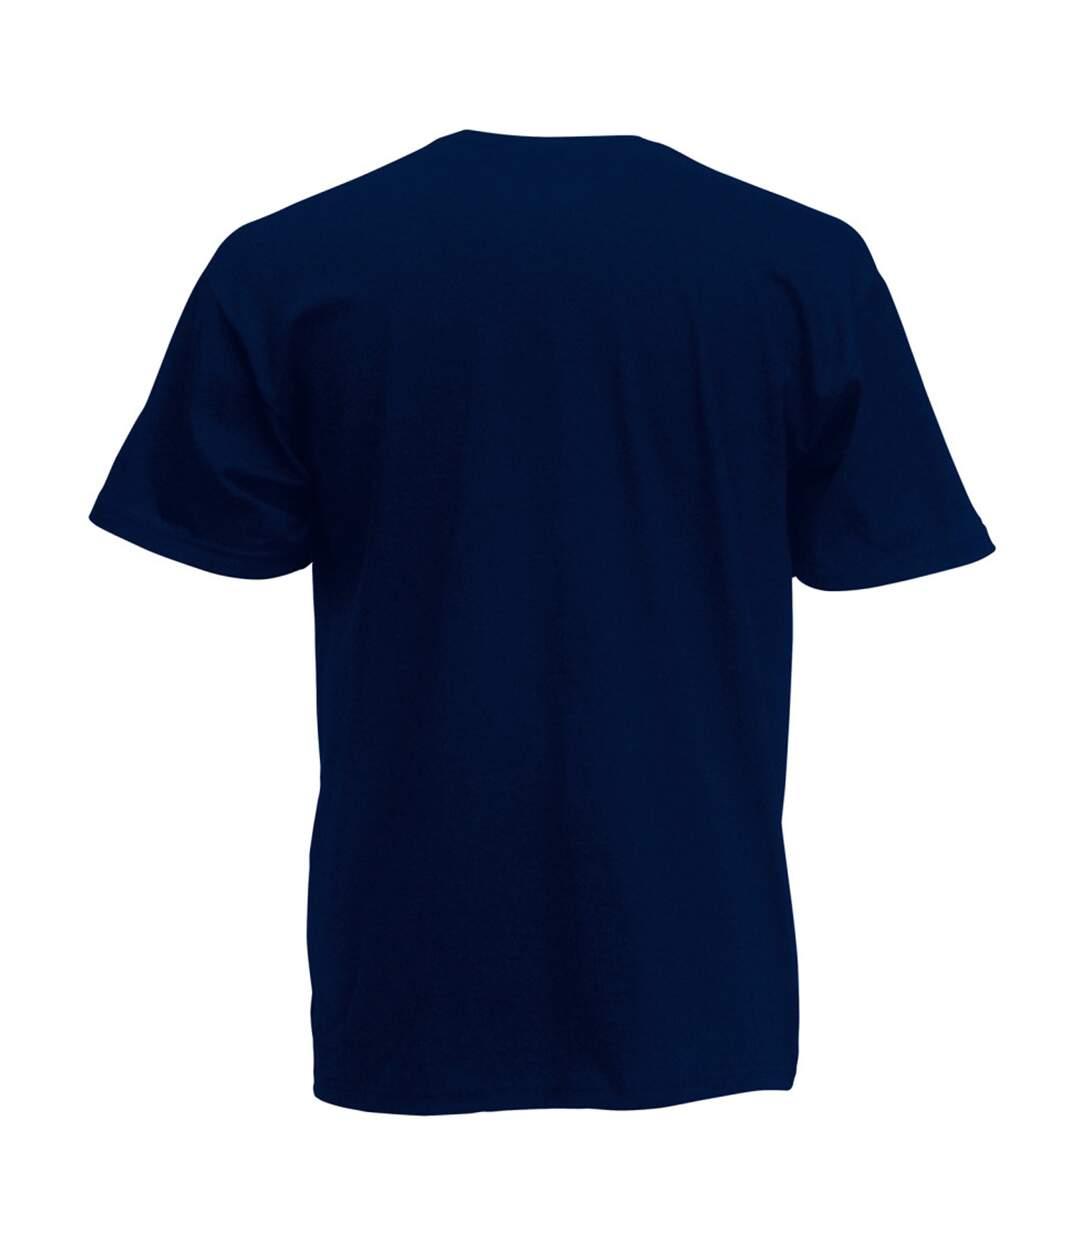 Mens Short Sleeve Casual T-Shirt (Midnight Blue) - UTBC3904